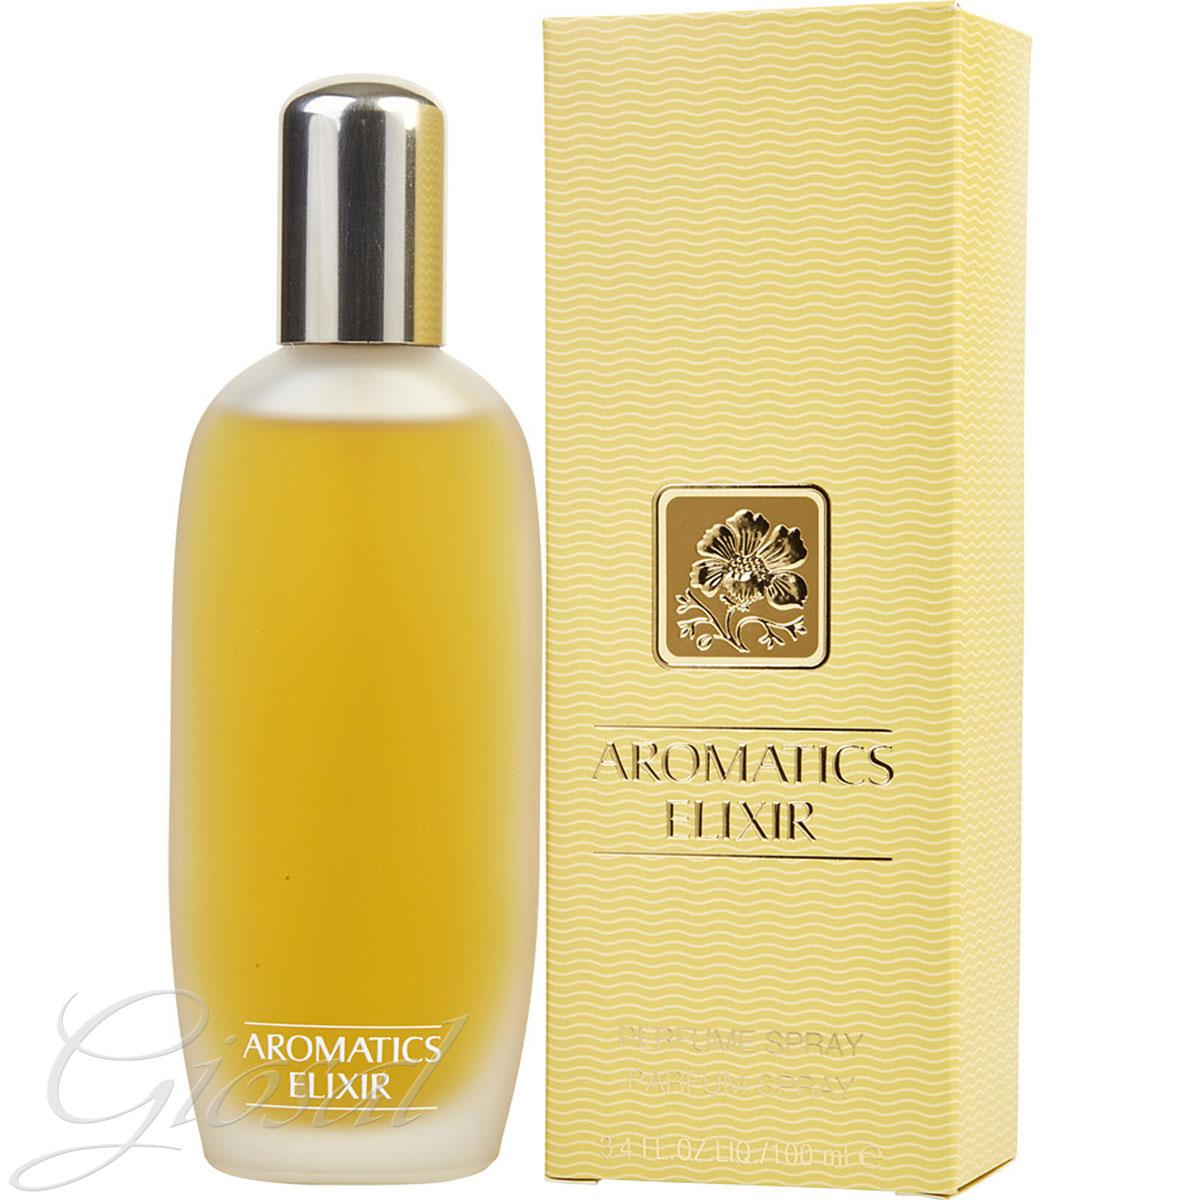 Detalles de Profumo da Donna Clinique Aromatics Elixir Eau de Parfum 25ml 45ml GIOSAL